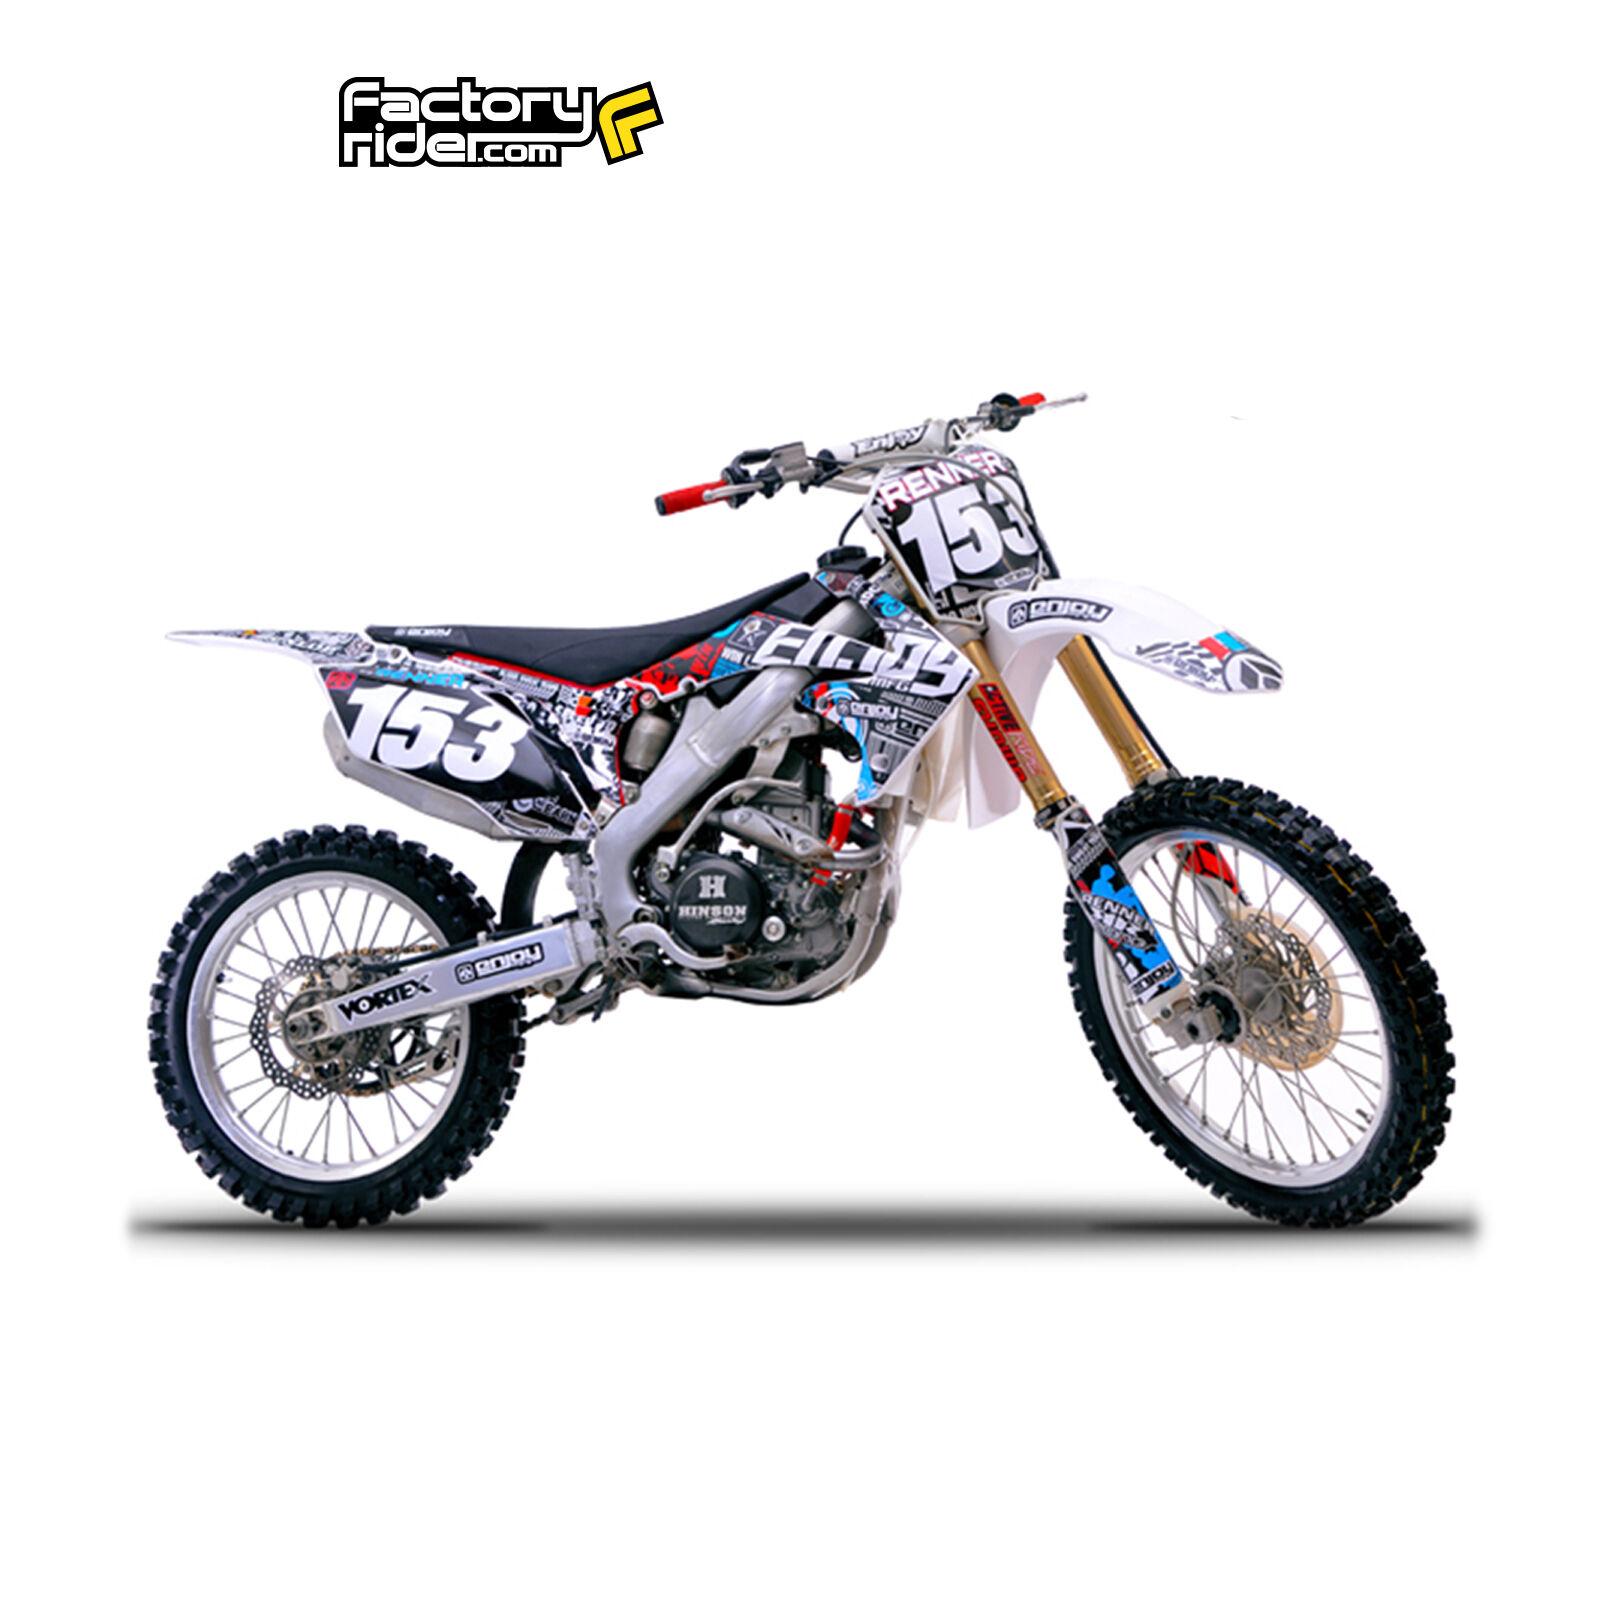 1 Of 4FREE Shipping 2010   2013 HONDA CRF 250 Dirt Bike Graphics Kit  Motocross Graphics Live U0026 Learn